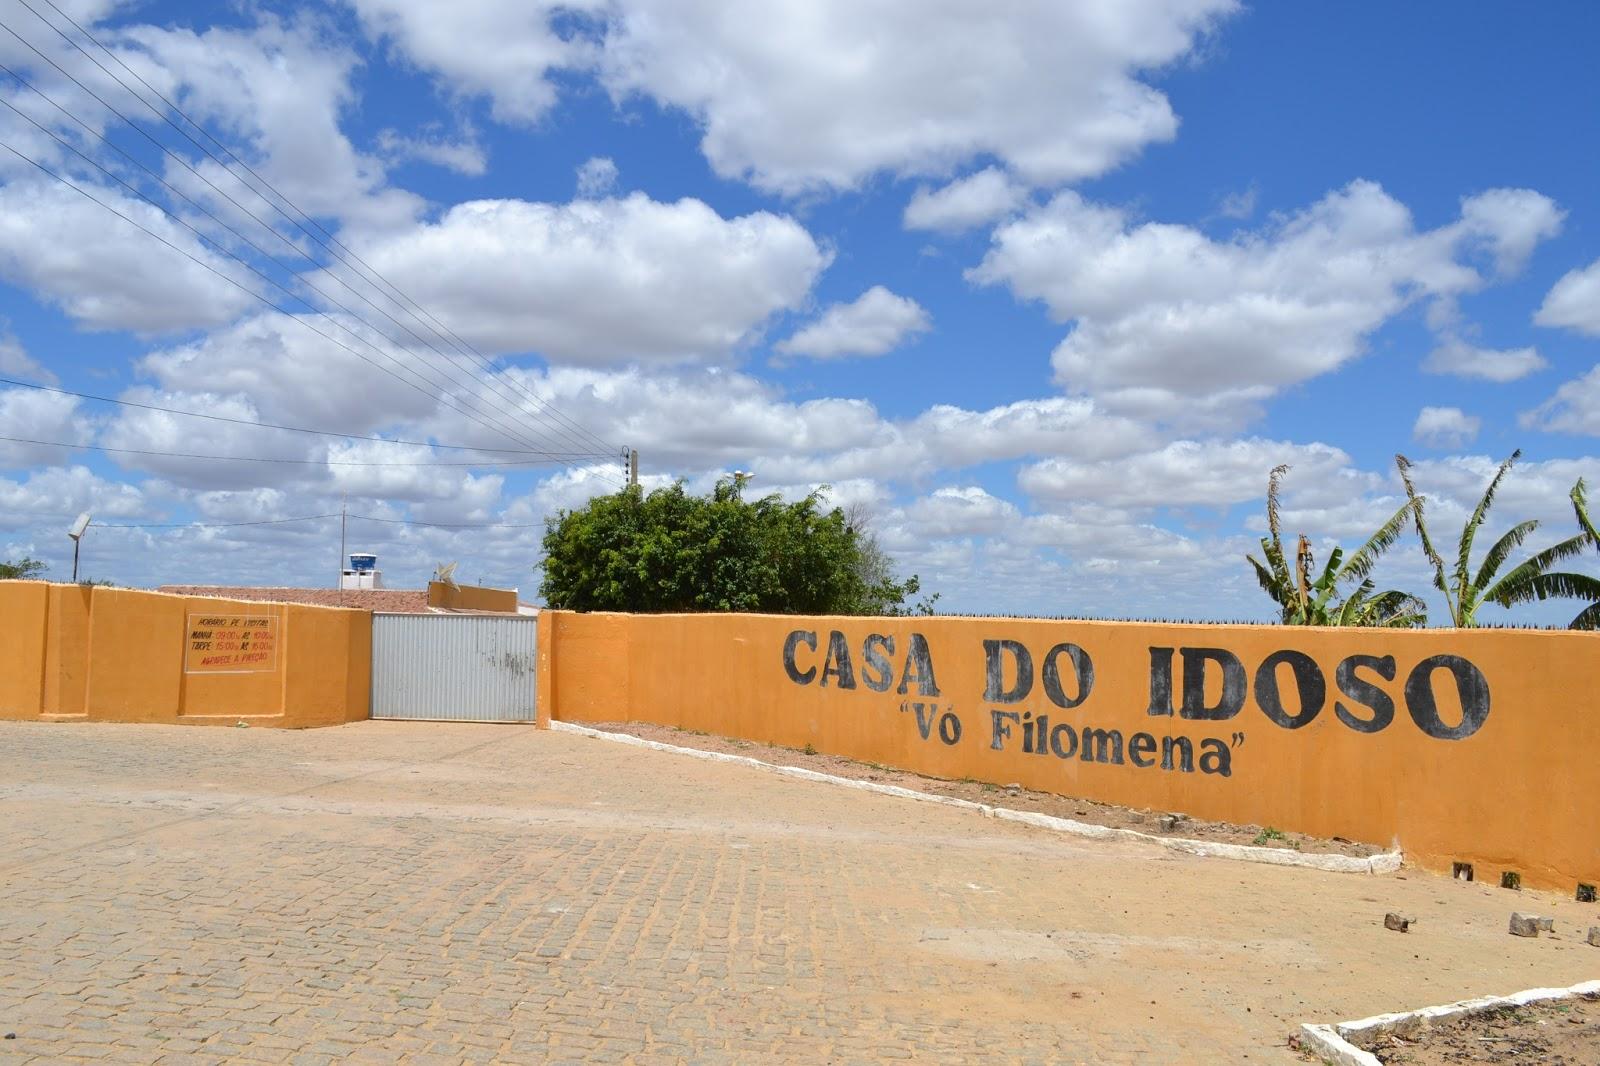 "Serra de Cuité: CASA DO IDOSO ""VÓ FILOMENA"" PARTICIPA DO BRINDE  #A26629 1600 1066"